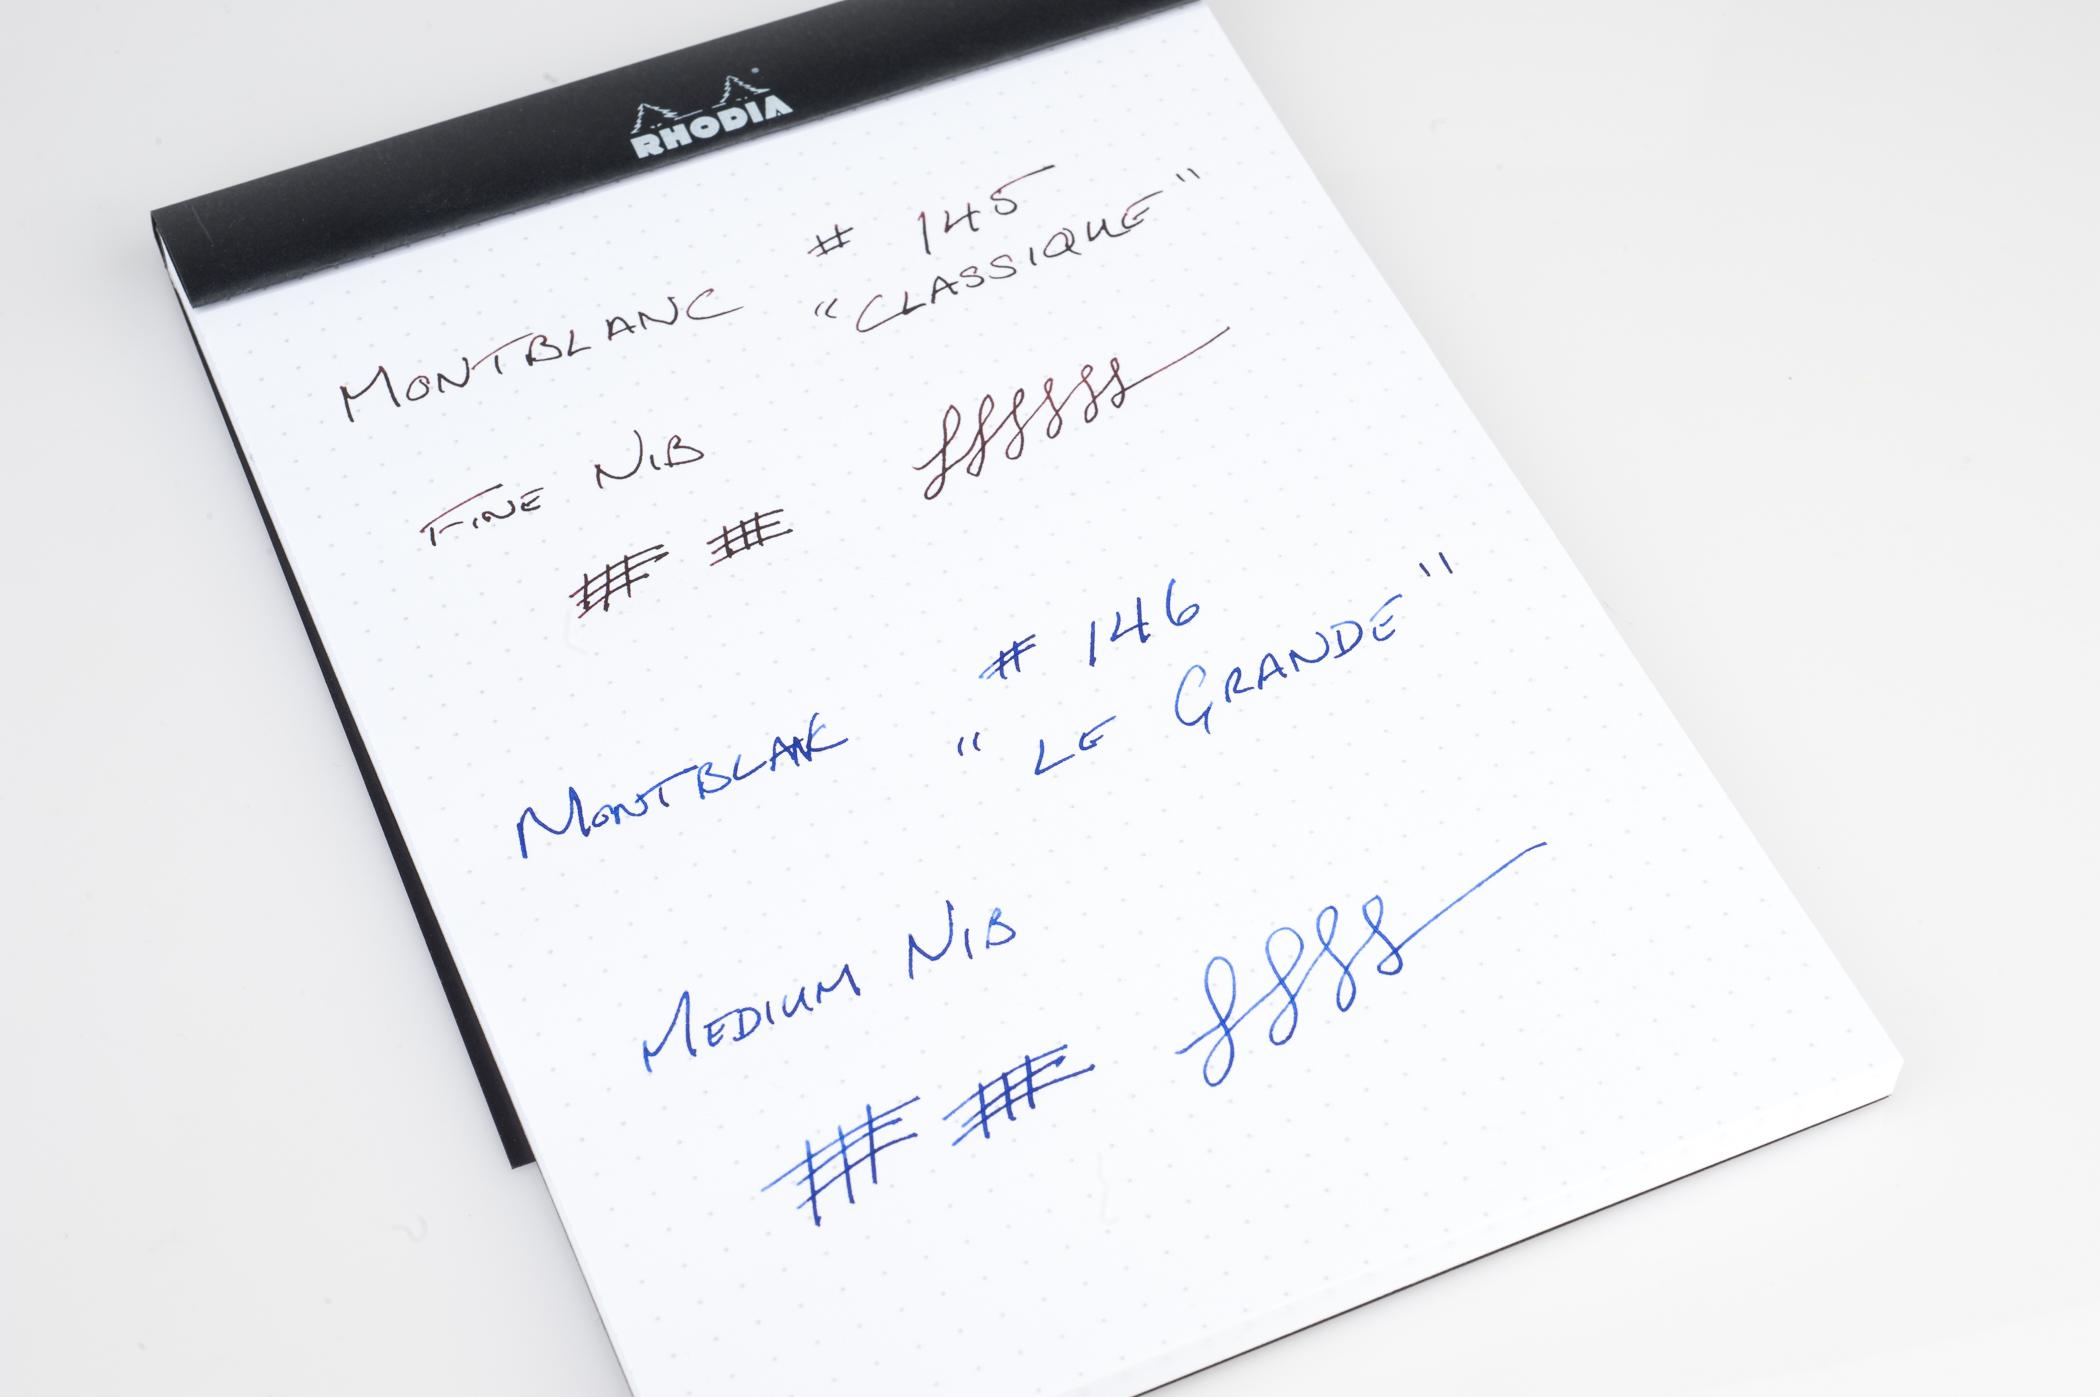 Montblanc Fountain Pen writing sample - 145 in fine nib and 146 in medium nib